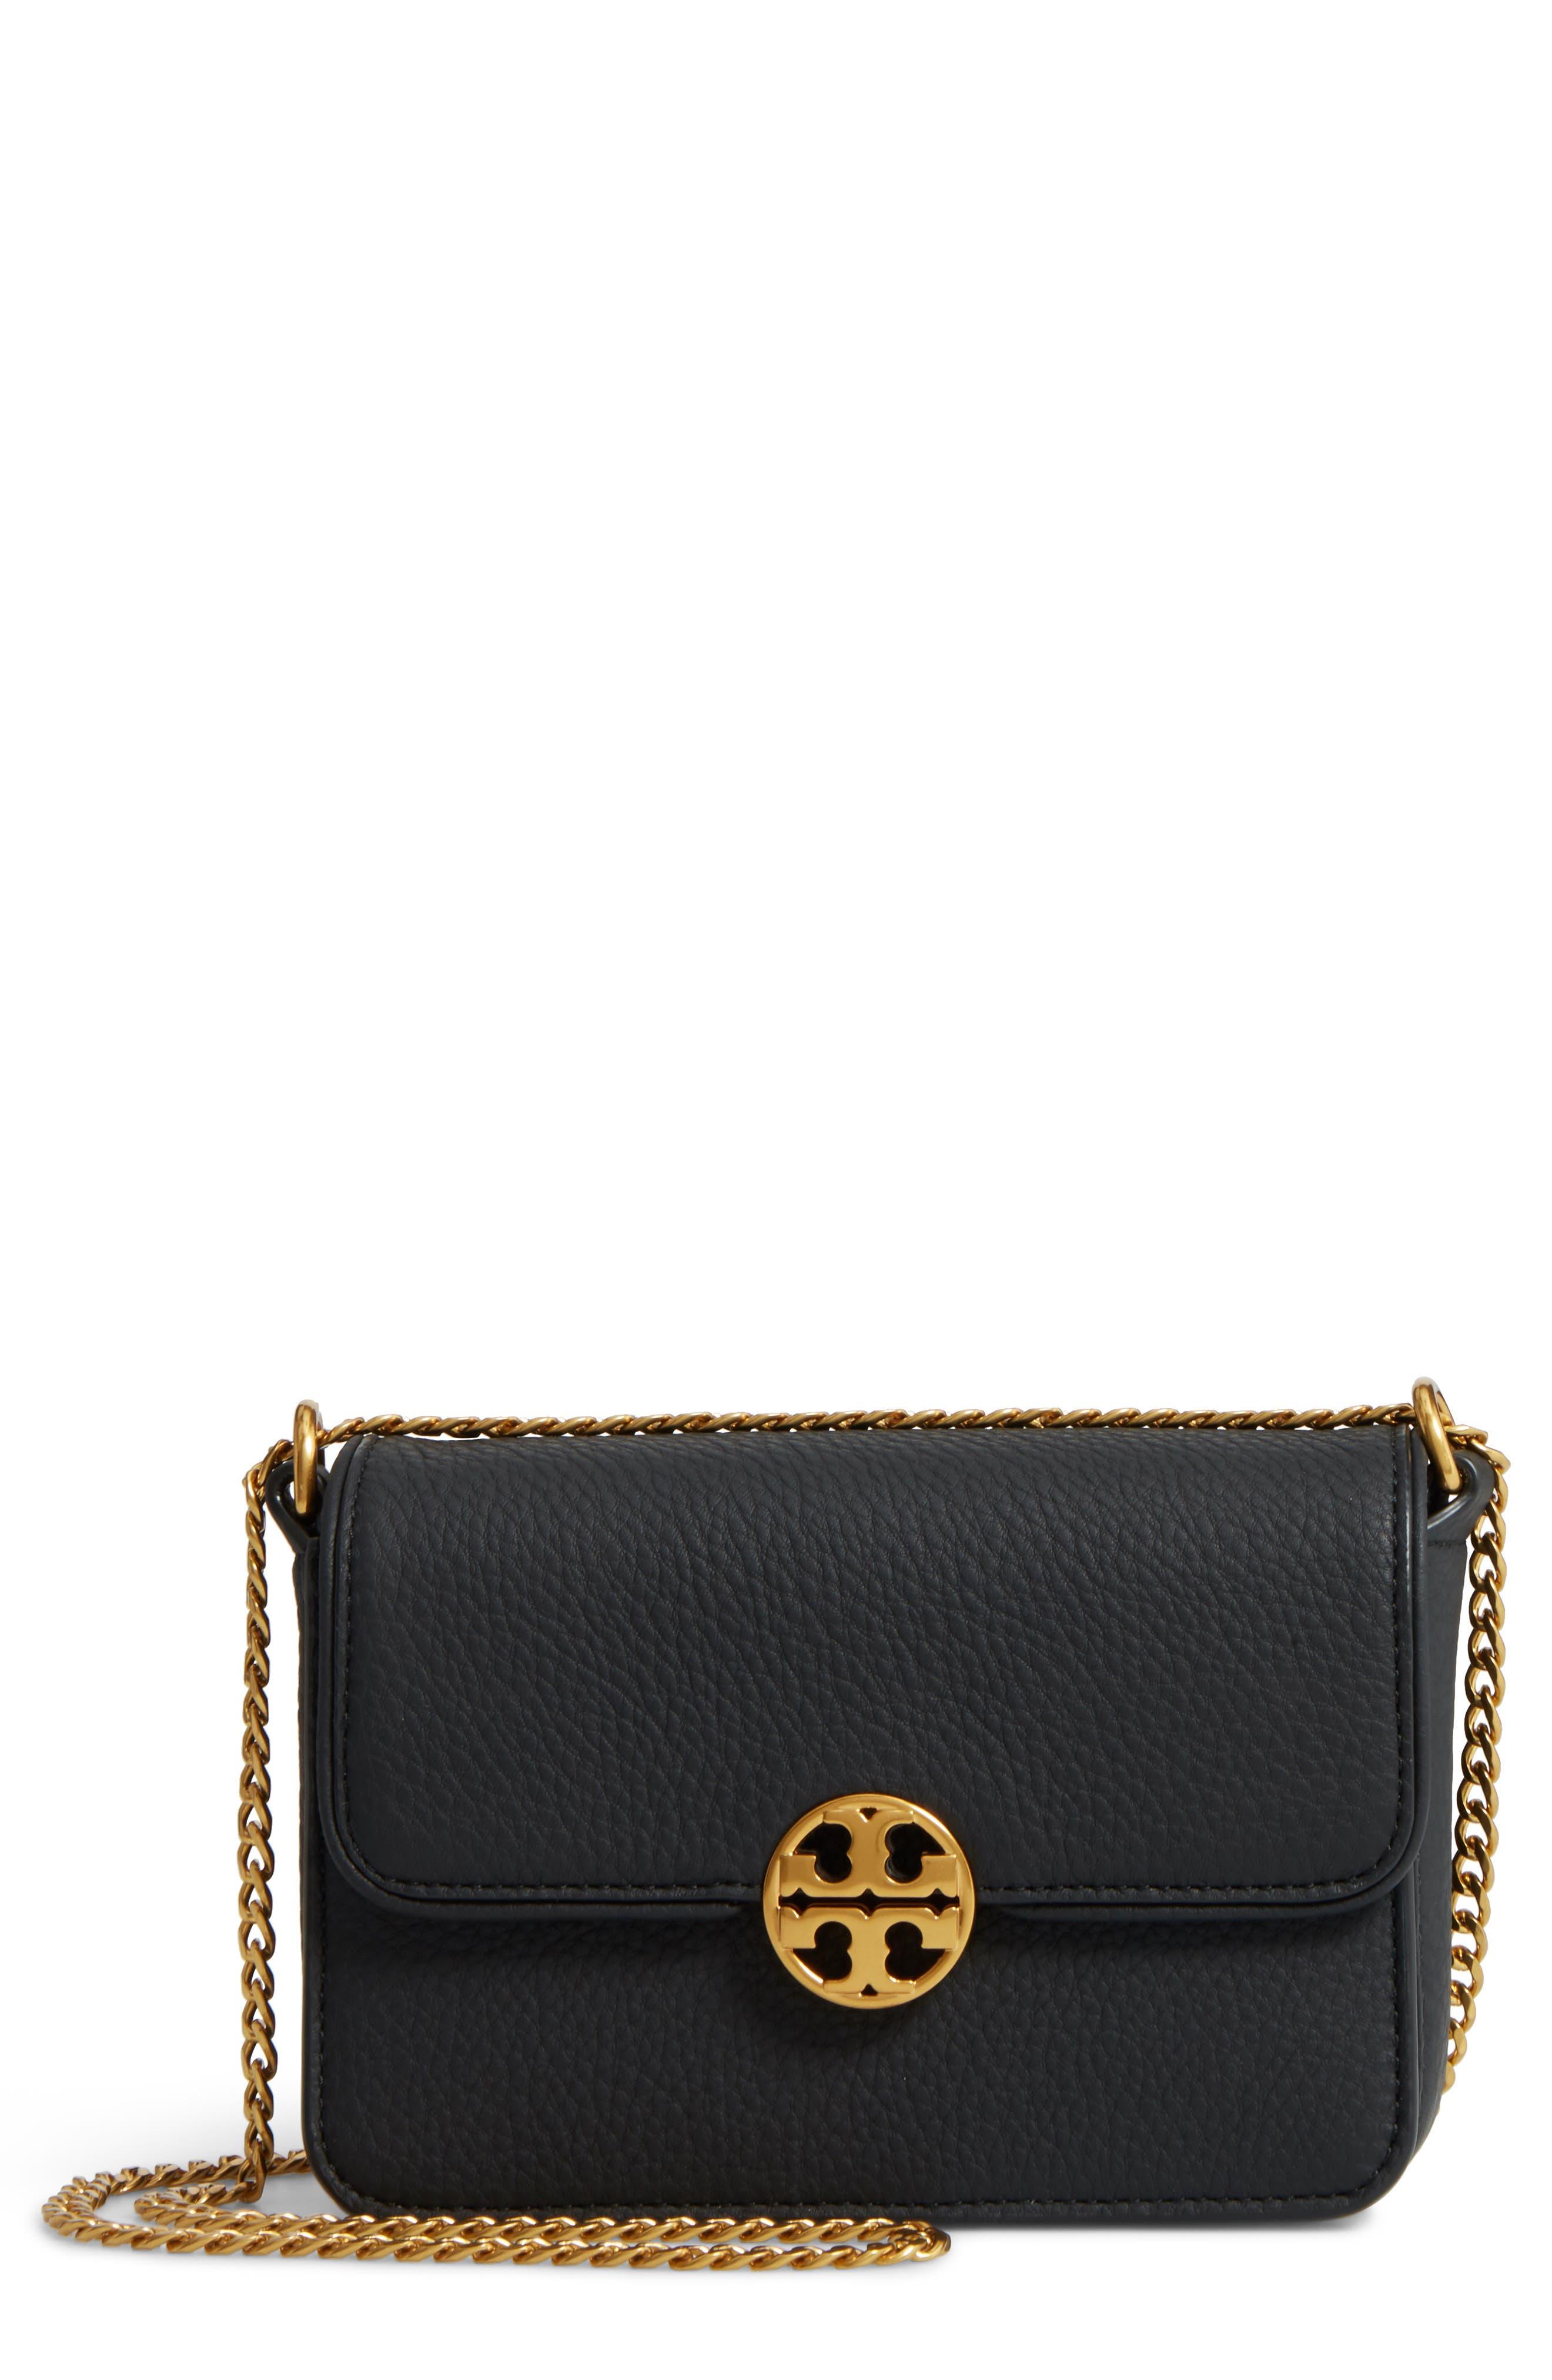 Mini Chelsea Leather Convertible Crossbody Bag,                         Main,                         color, 001